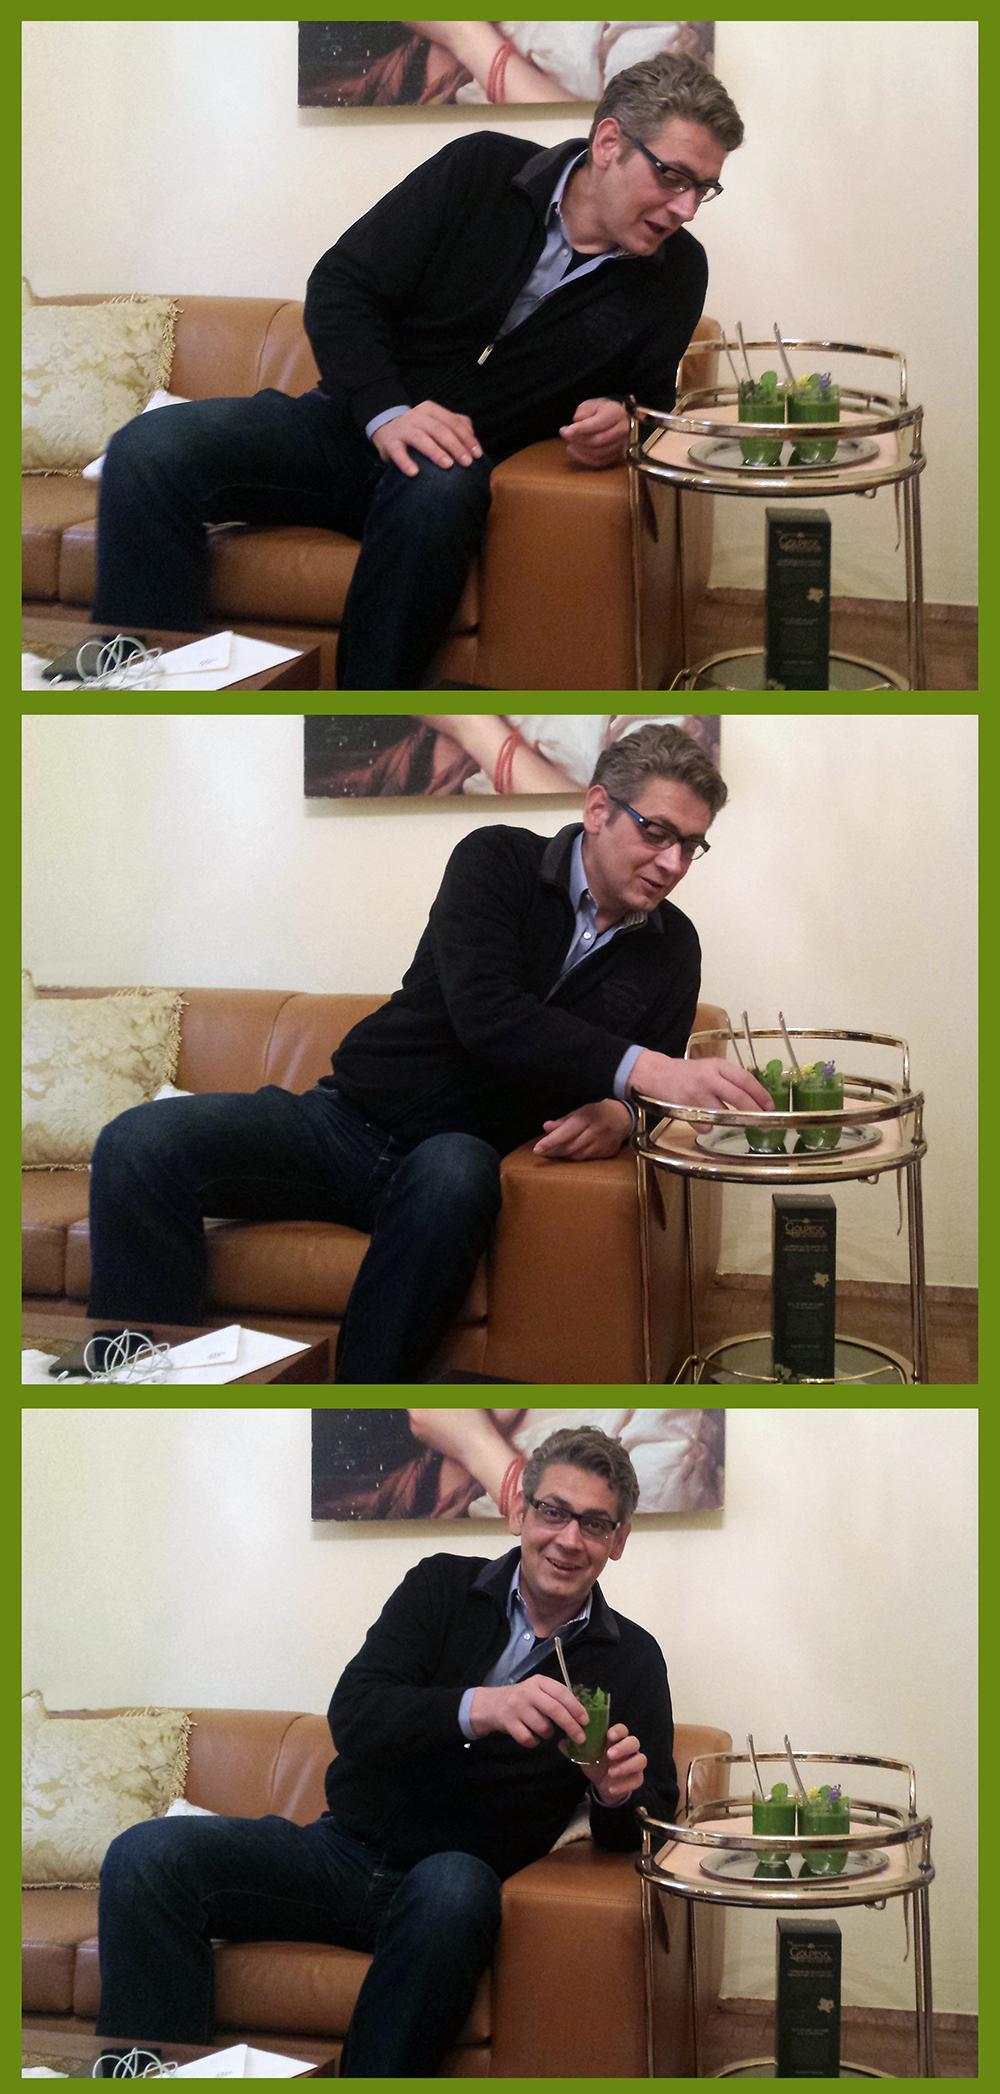 Gerhard_kostet_Smoothies